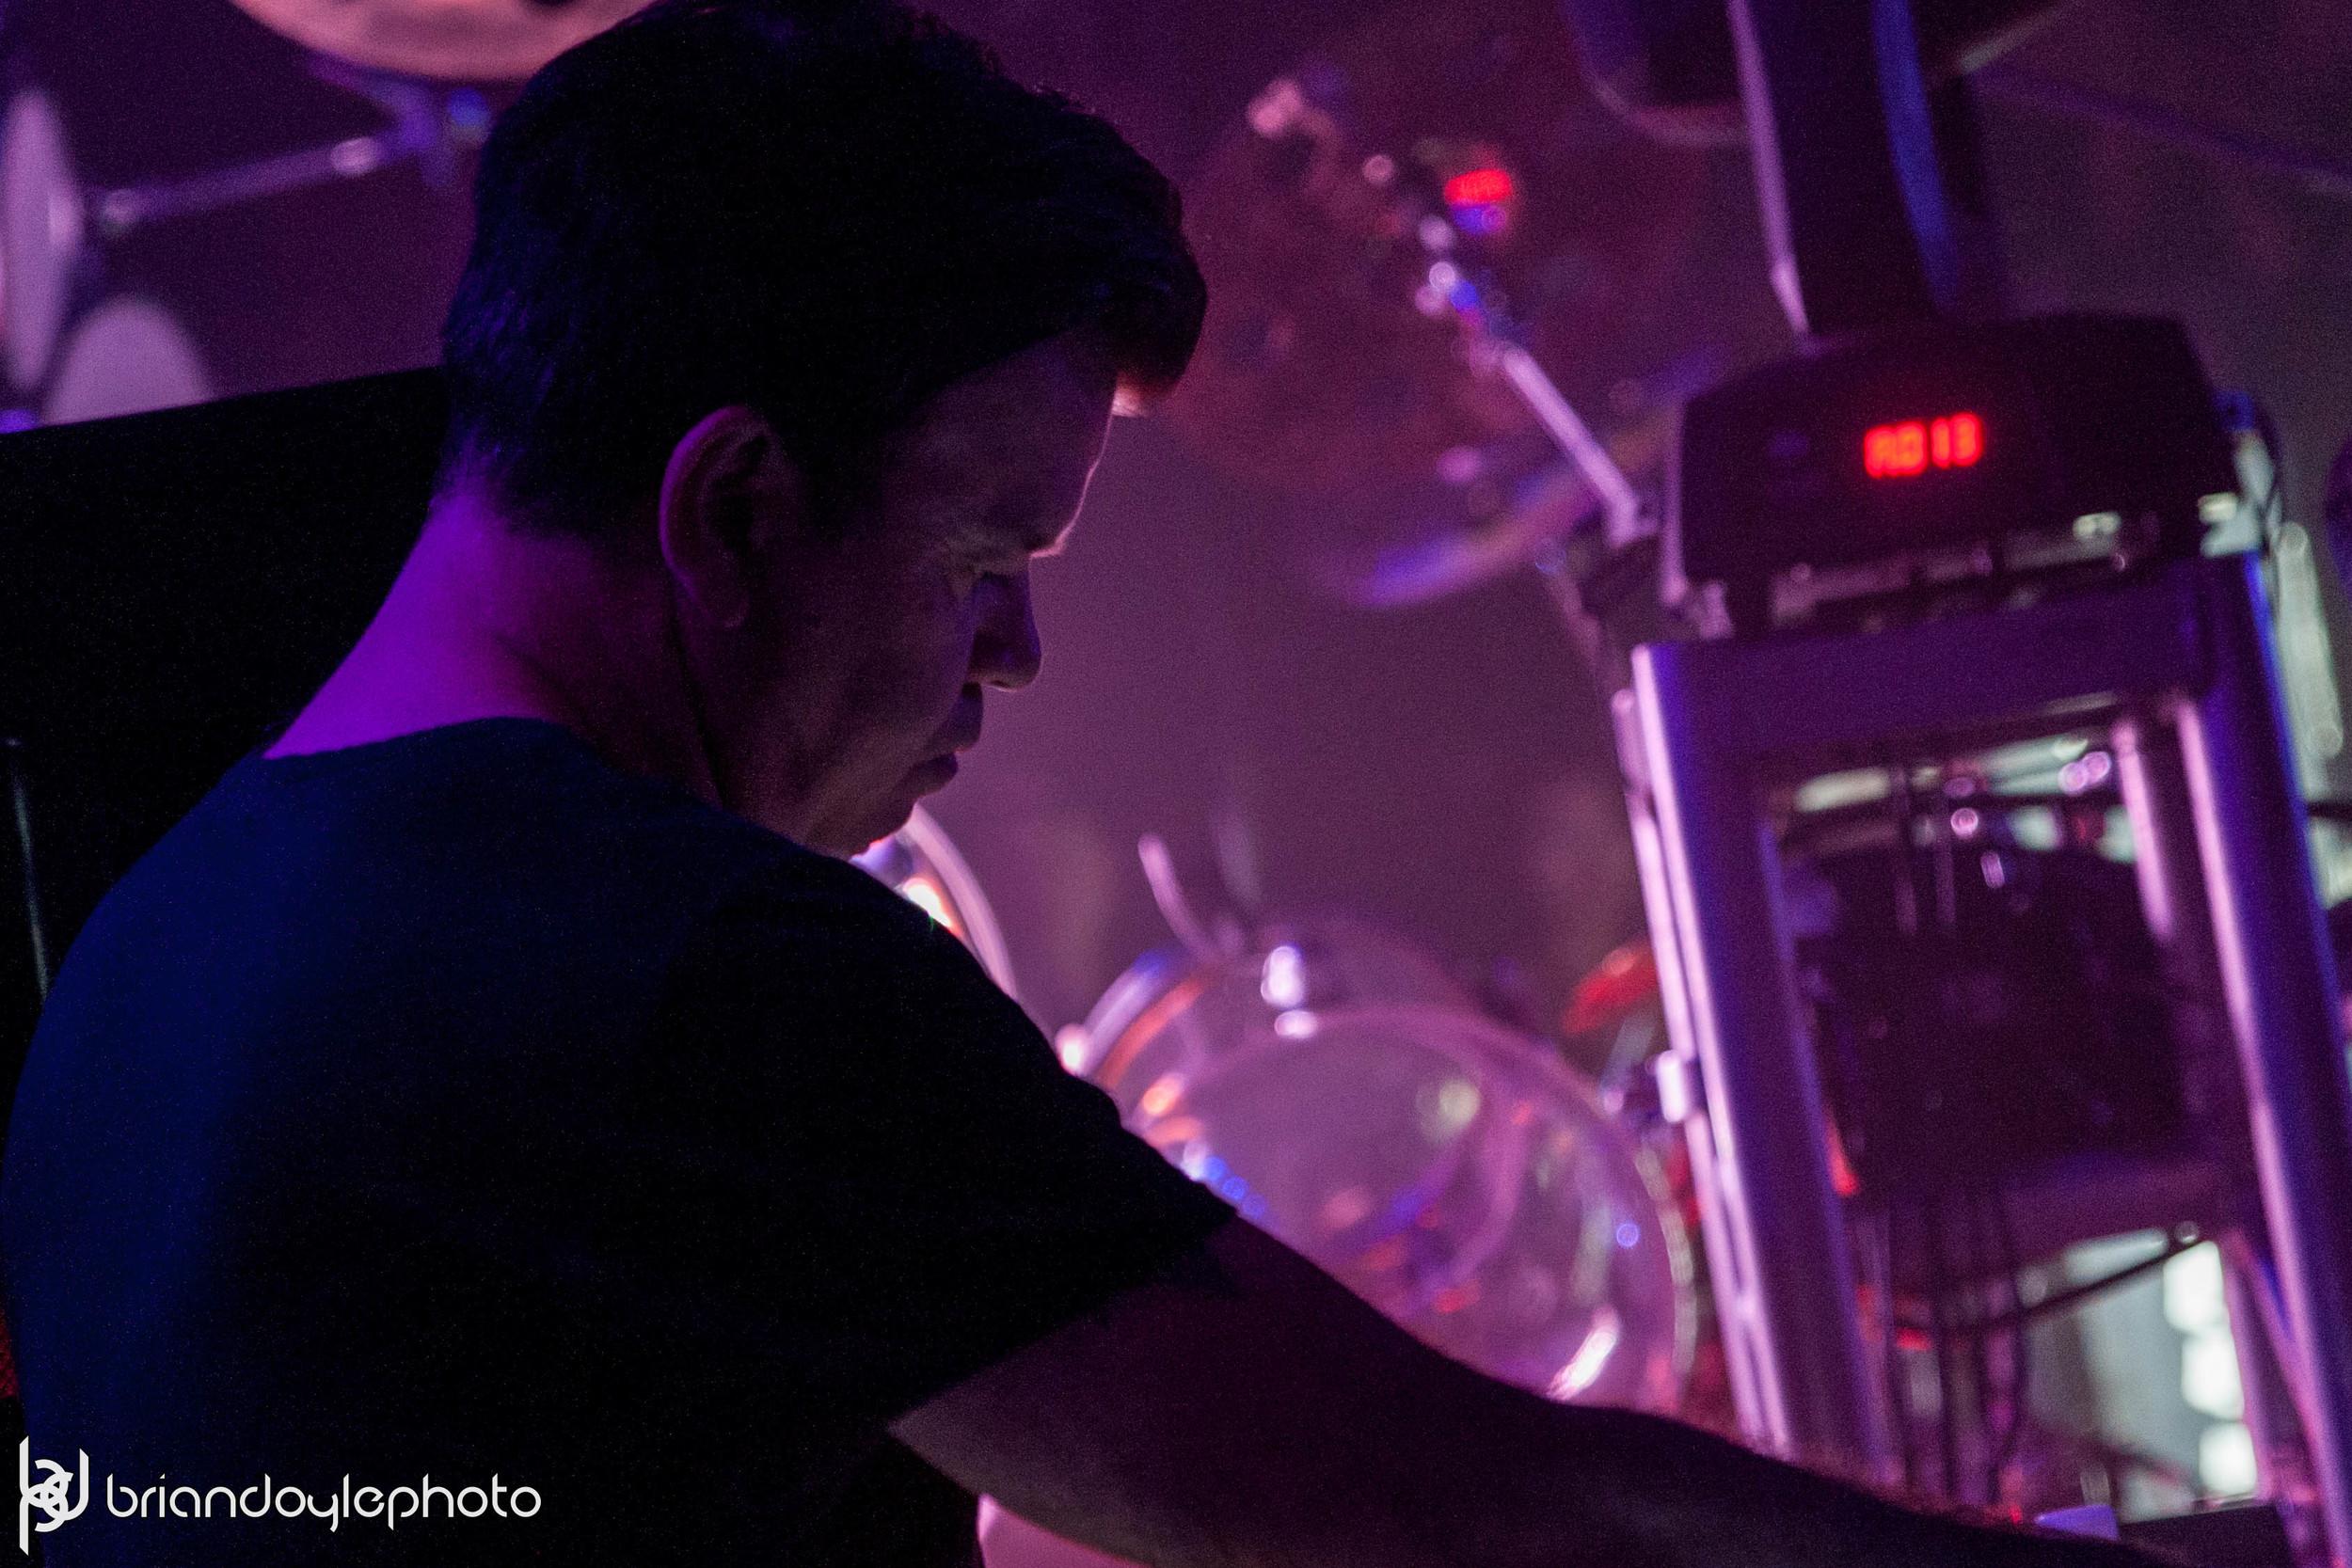 Jagermeister Presents - Paul Oakenfold @ Avalon bdp 27.09.14-46.jpg